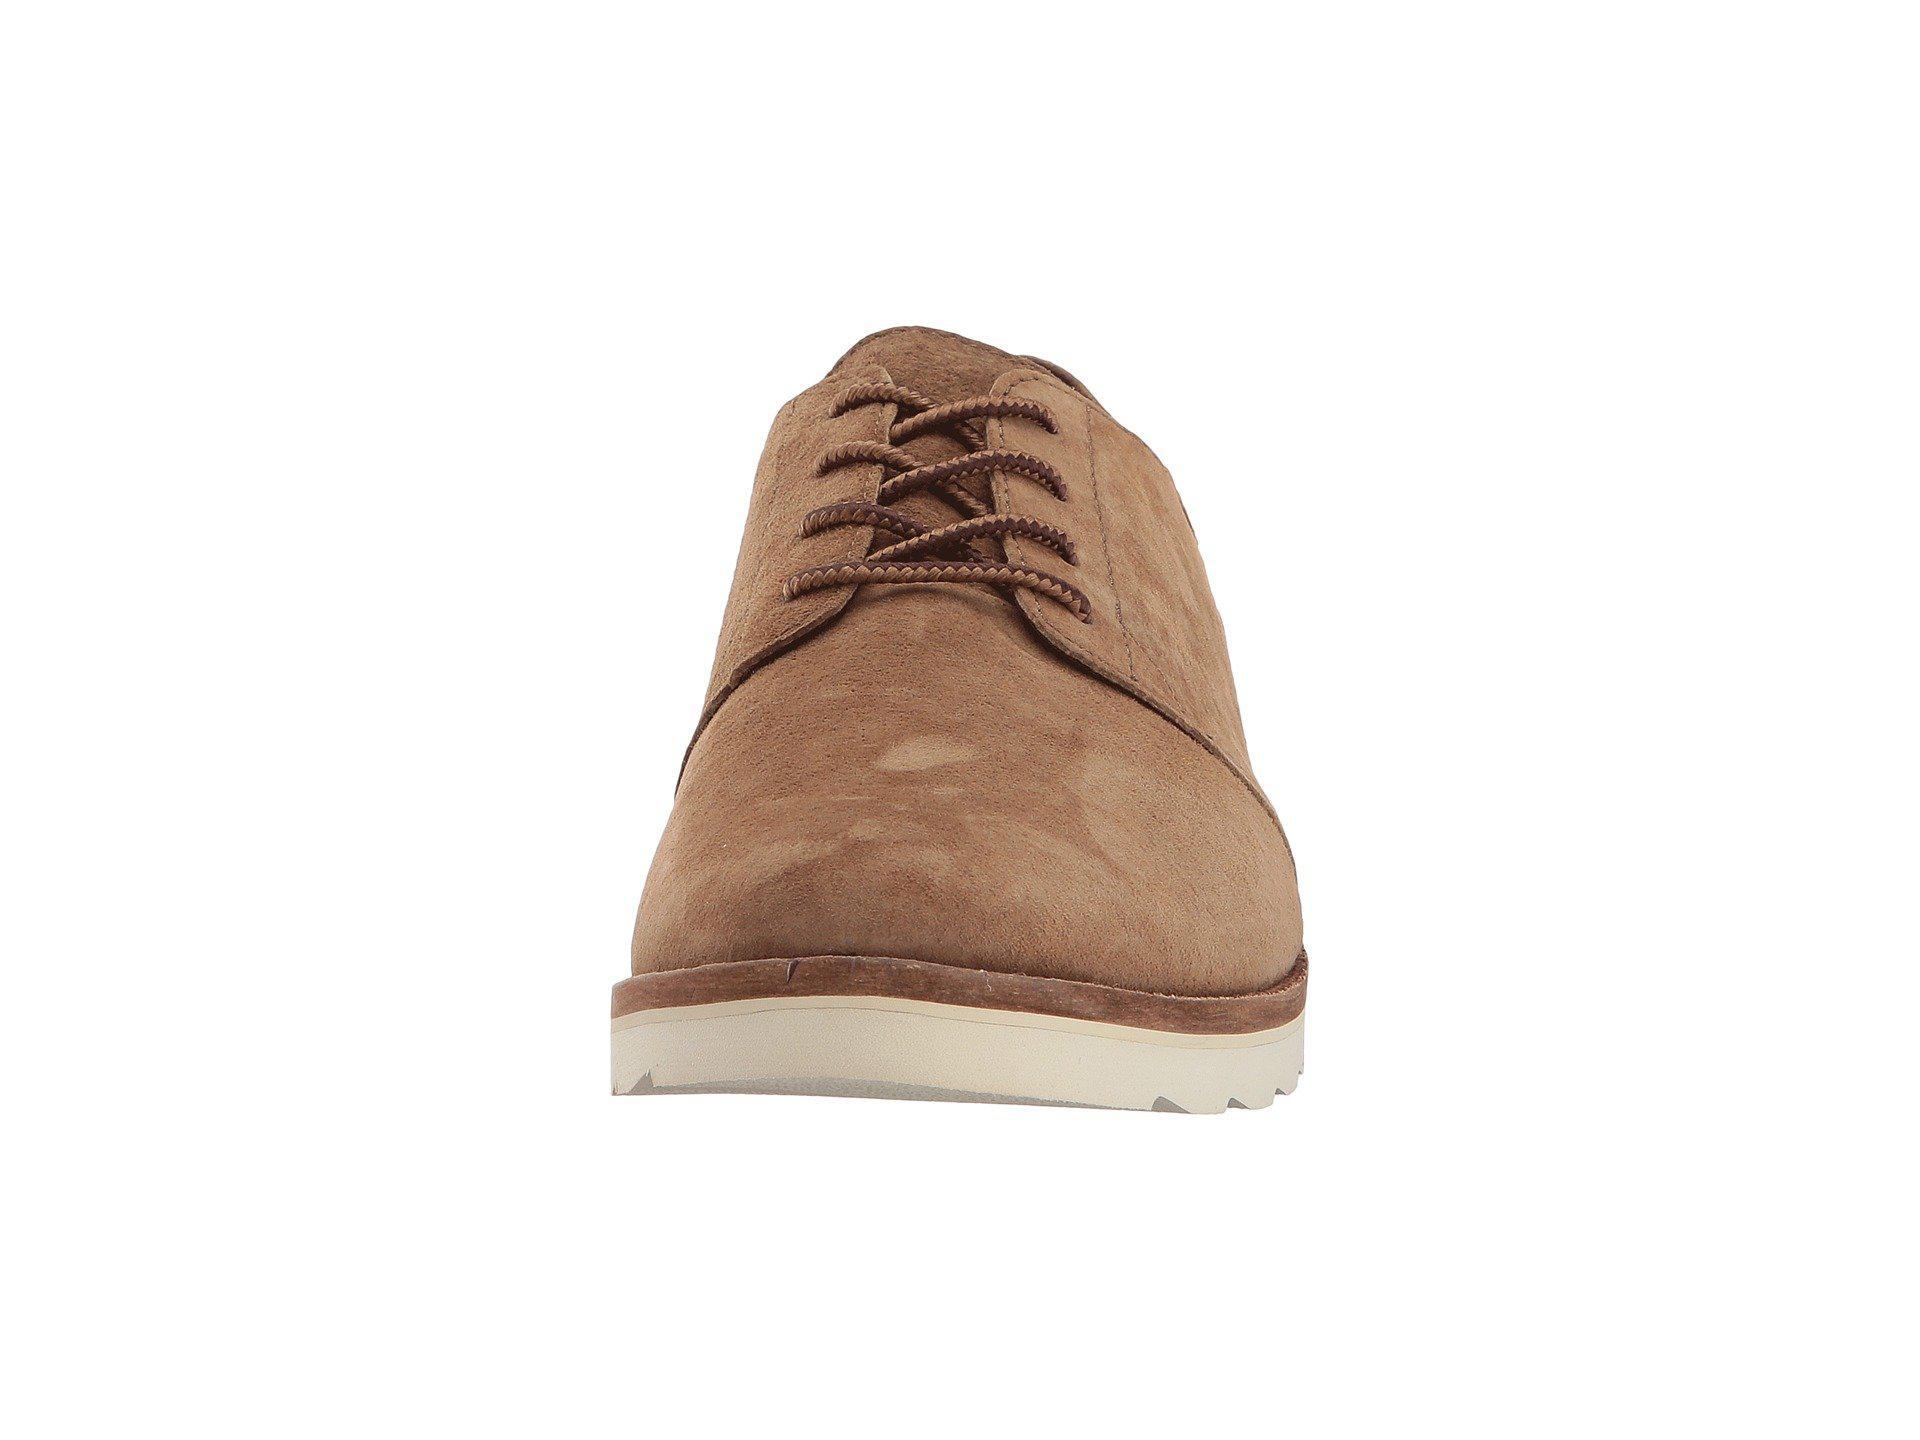 ea9e546f5a Lyst - Vans Desert Low in Brown for Men